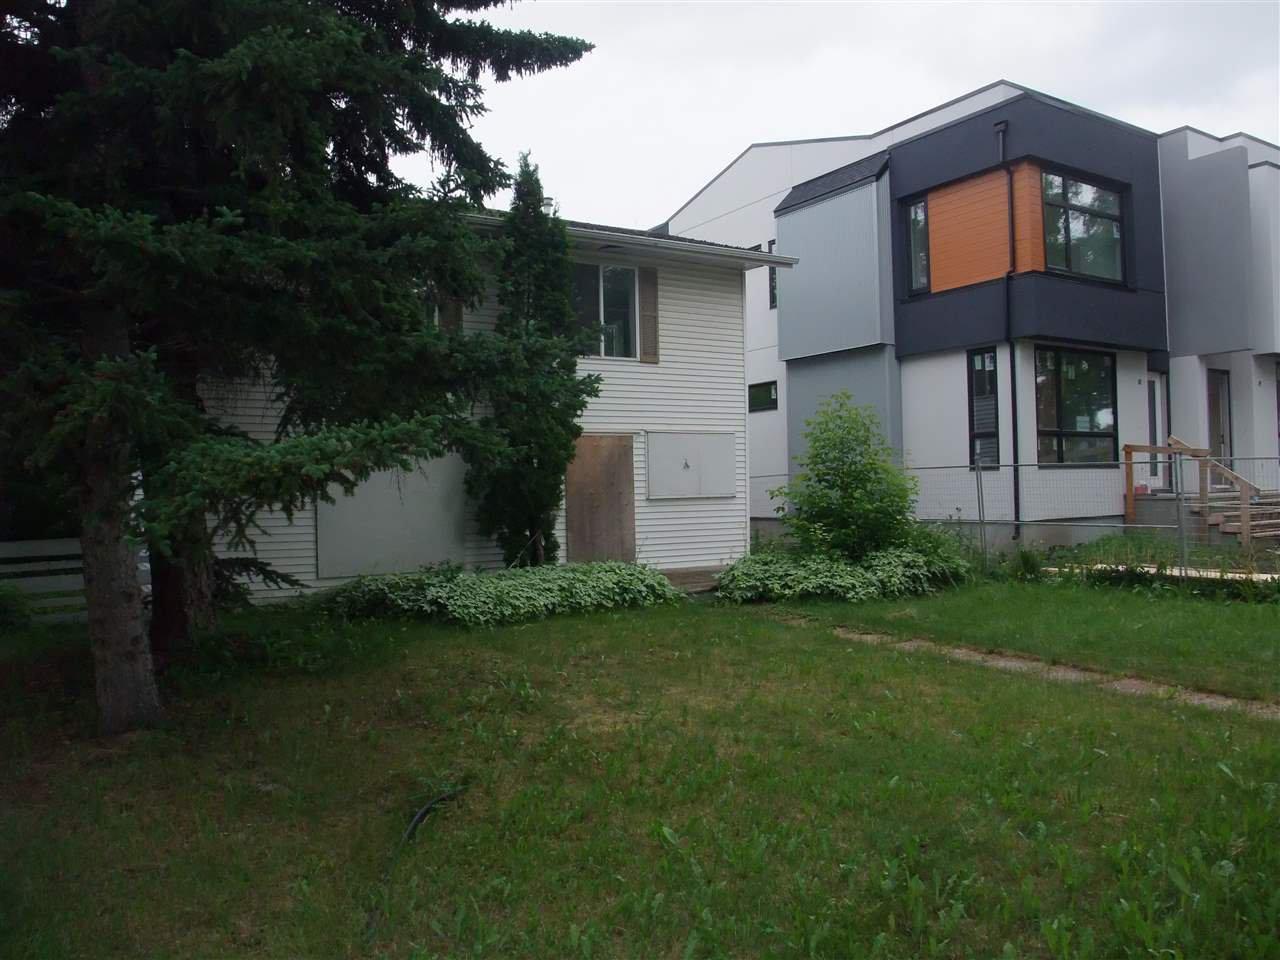 Main Photo: 10352 146 Street in Edmonton: Zone 21 House for sale : MLS®# E4204500